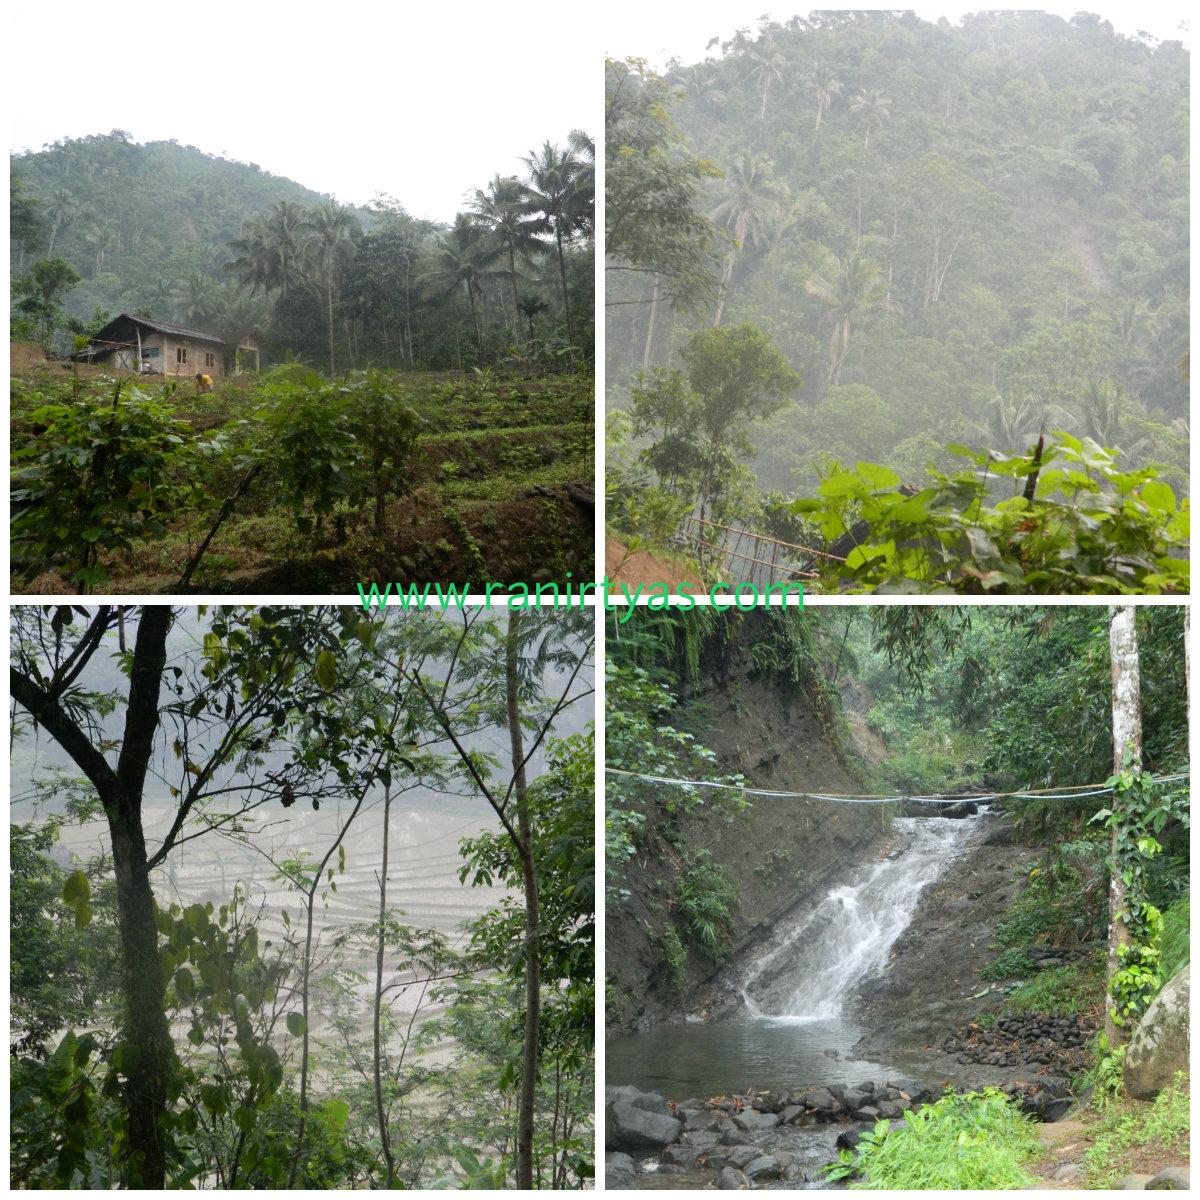 Desa Wisata Panusupan Purbalingga Coretan Ran Mungkin Ikut Mendaki Melihat